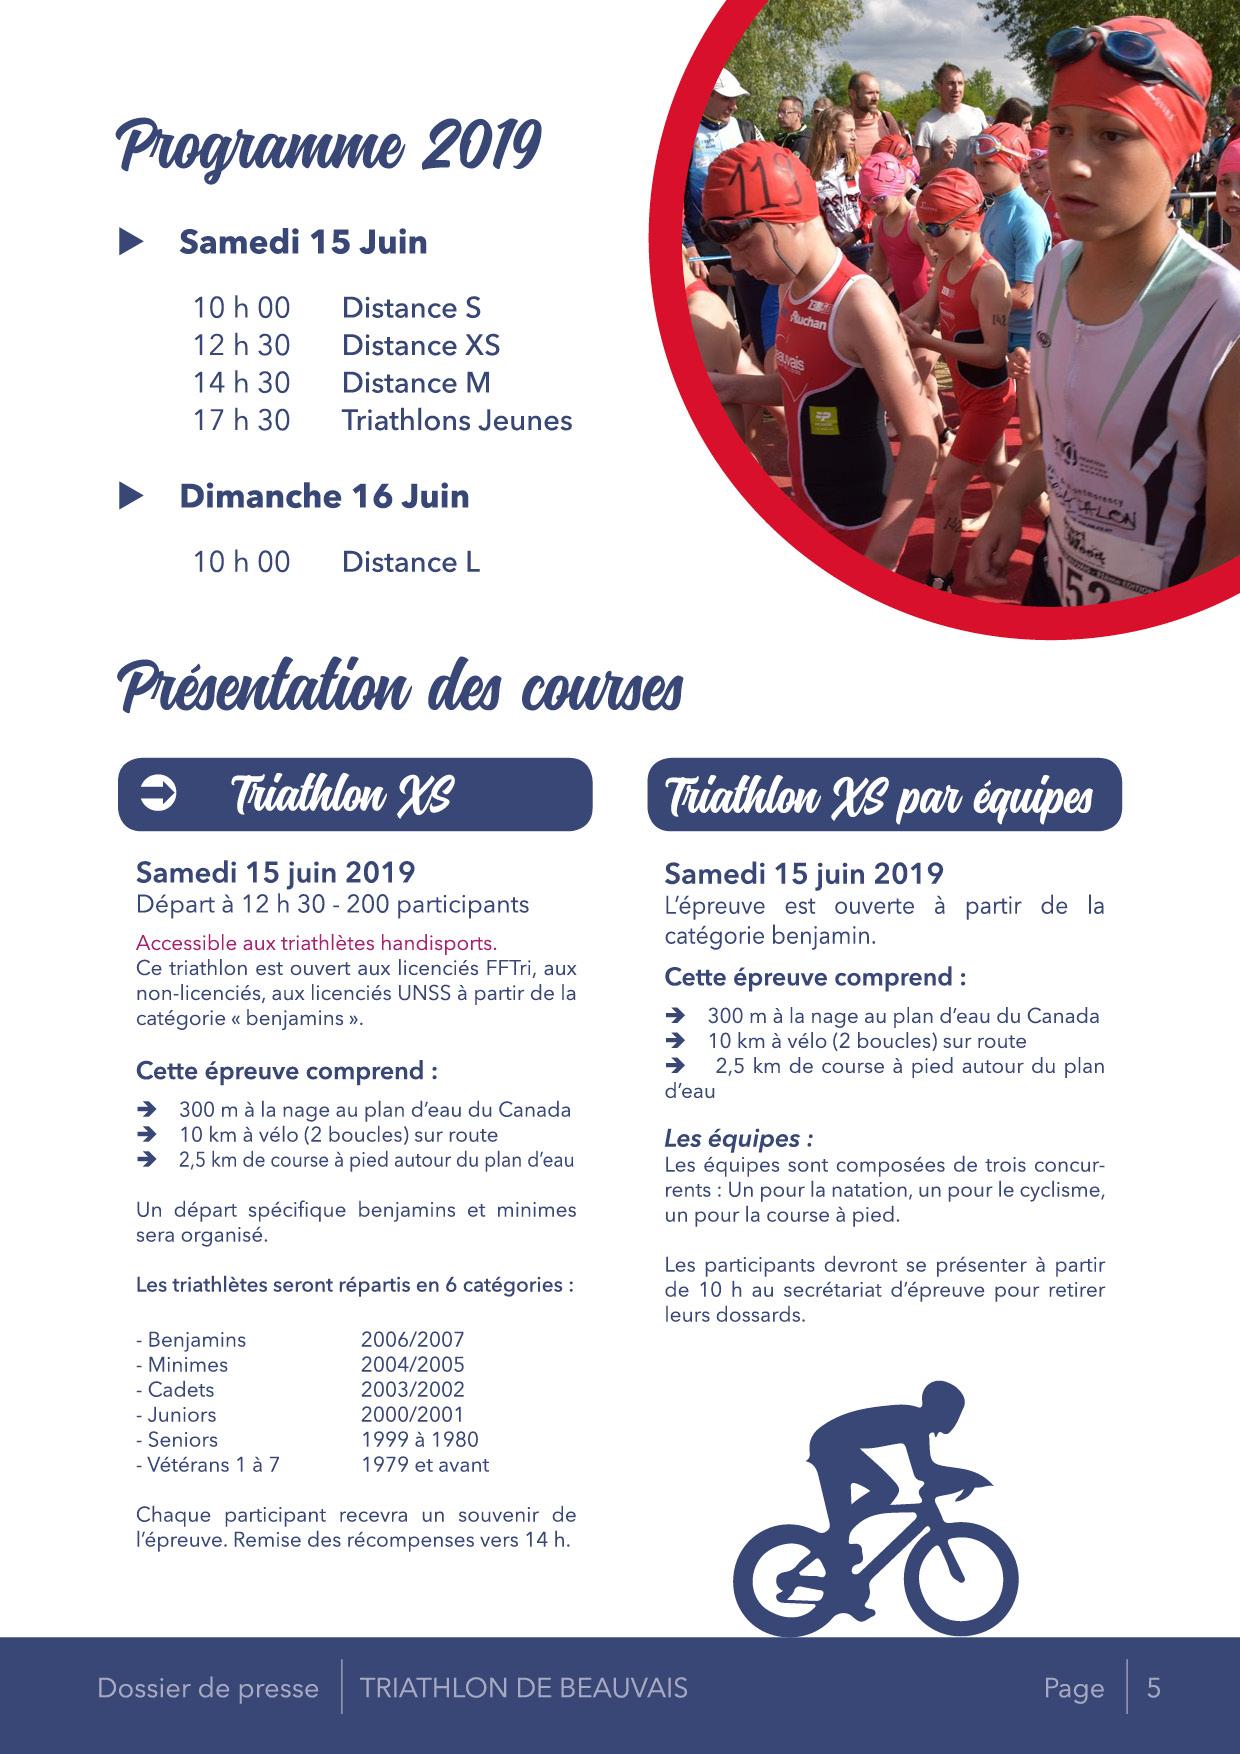 dossier-presse-triathlon-beauvais-vec5